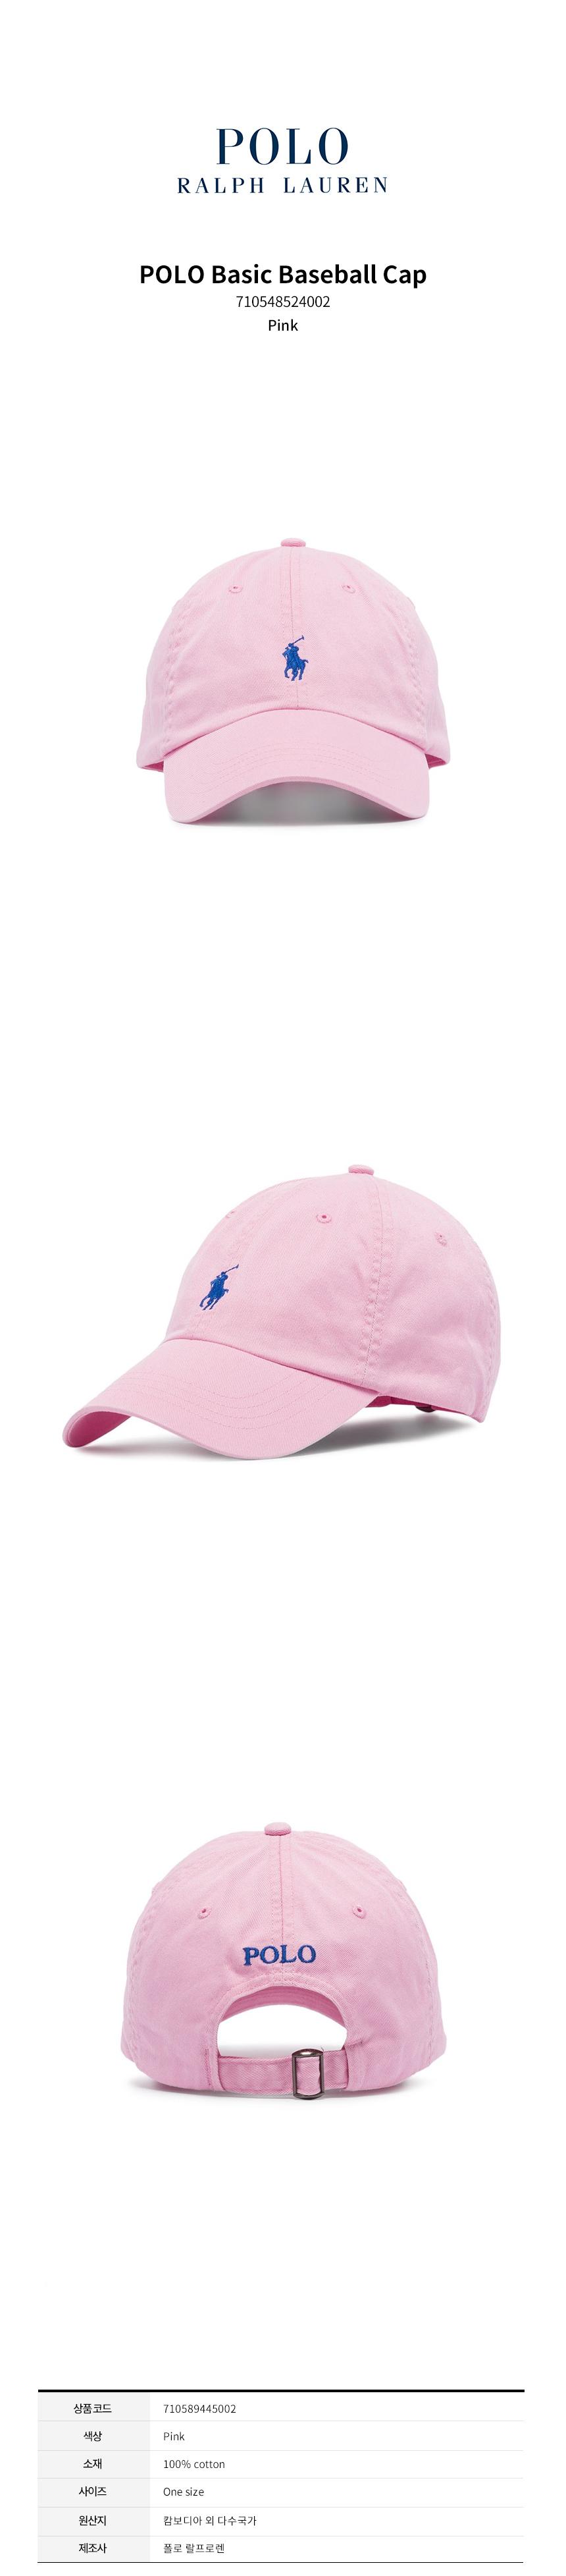 710548524002_pink.jpg